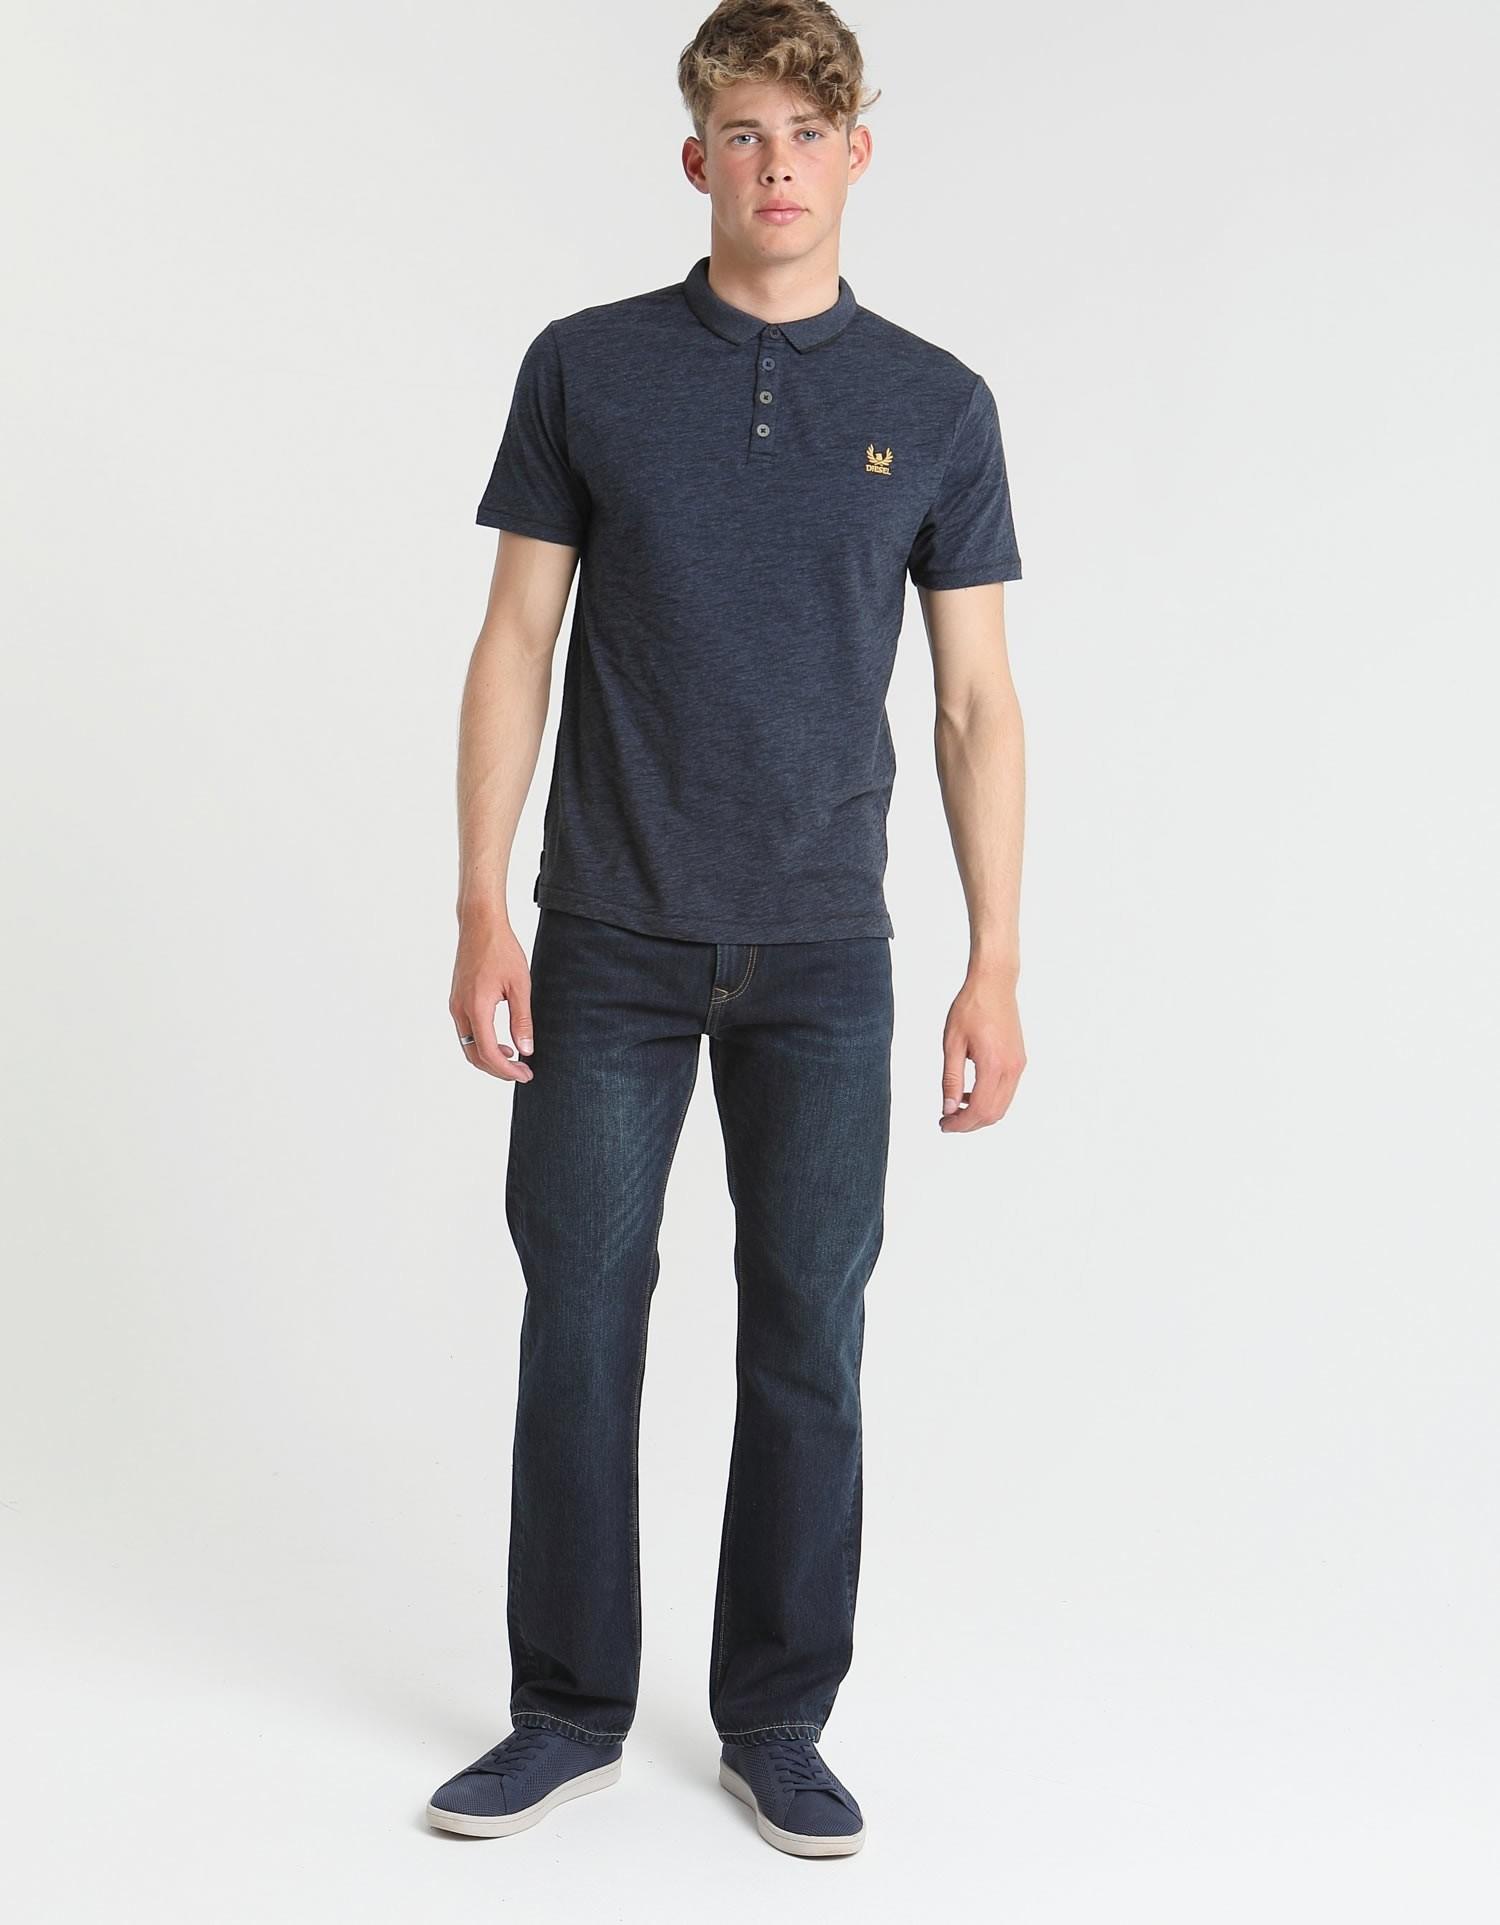 43247600262 Clark Dexter Bootcut Jean In Dark Blue - Clothing Store Bray, Co ...